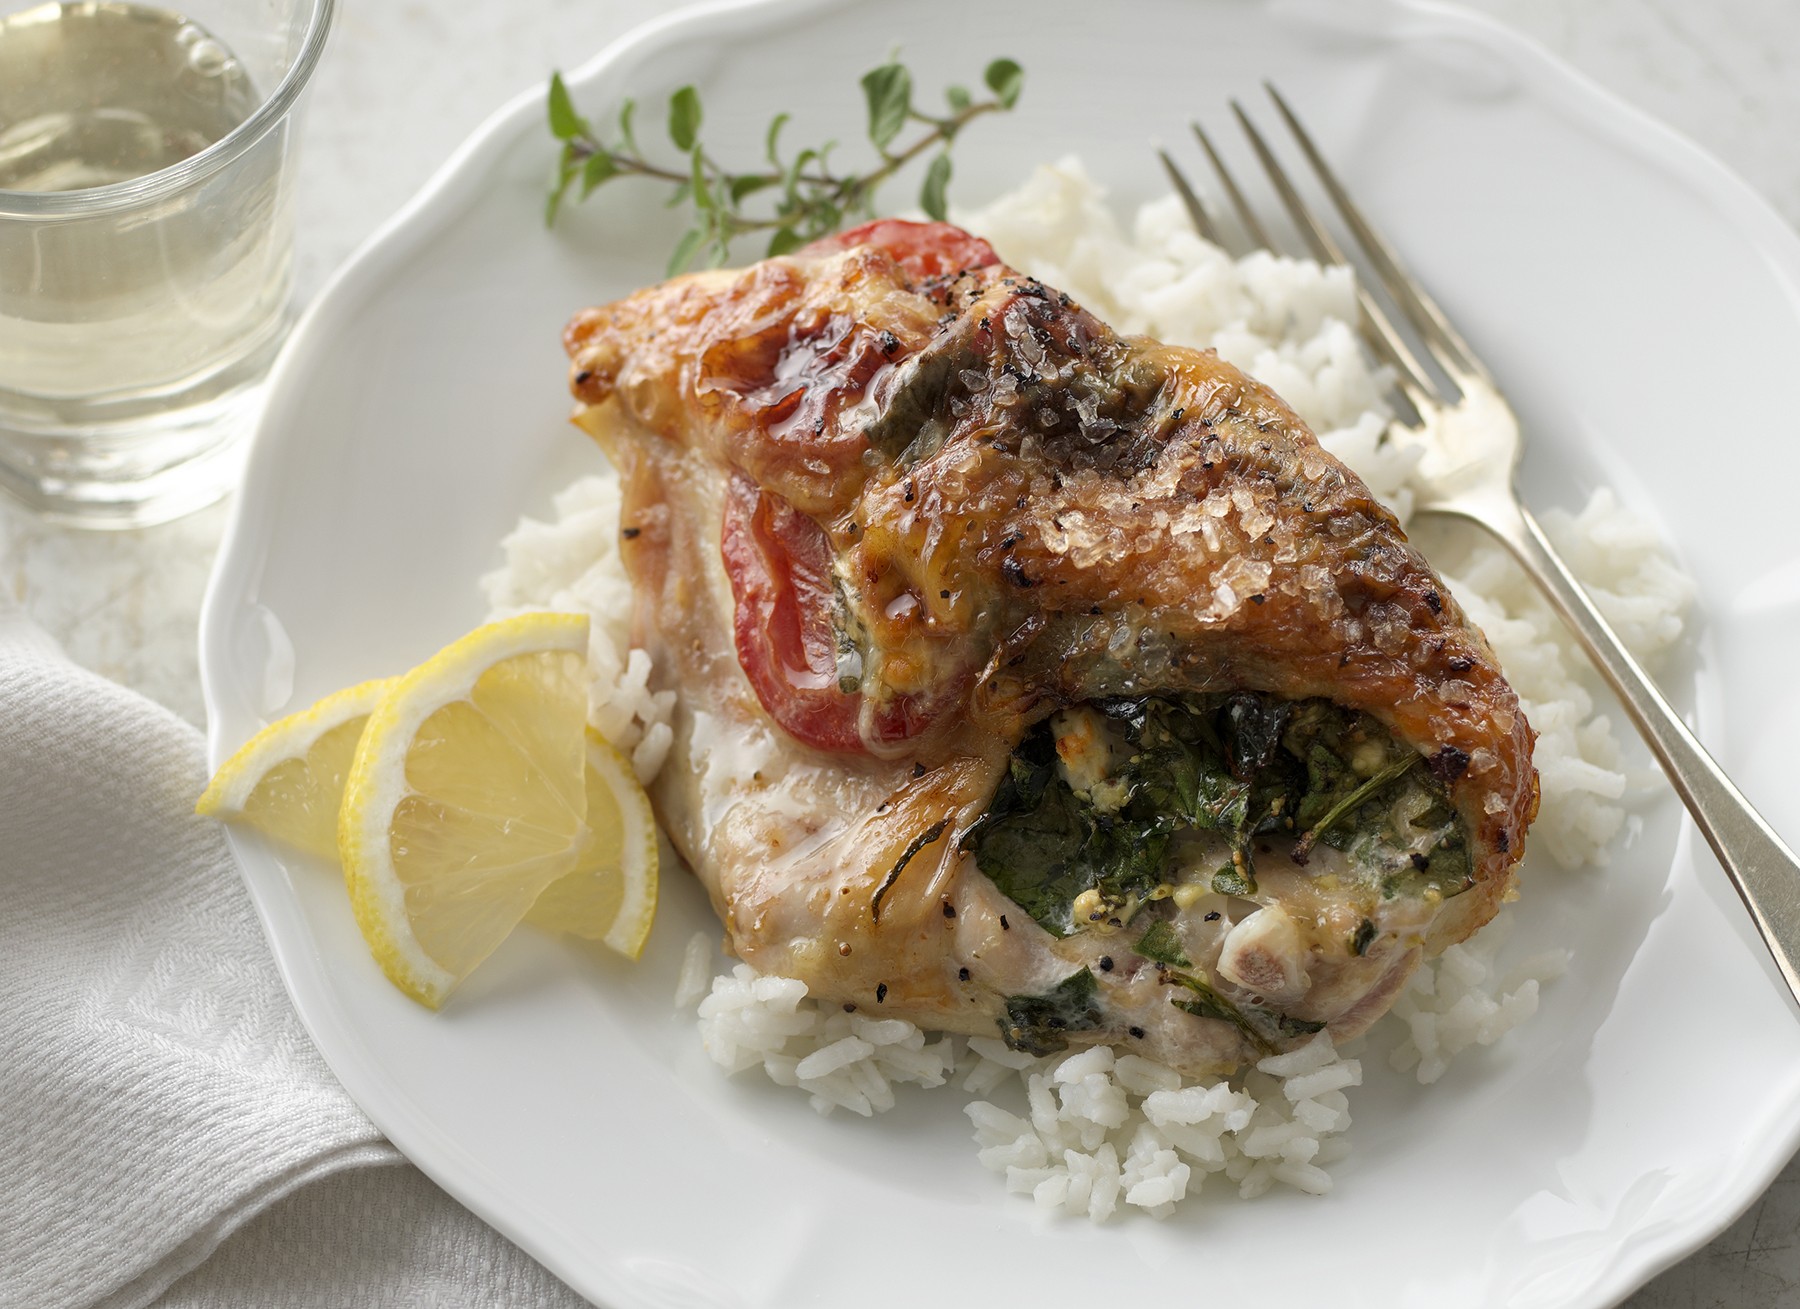 Italian-Style Chicken Breast Recipes - Allrecipescom